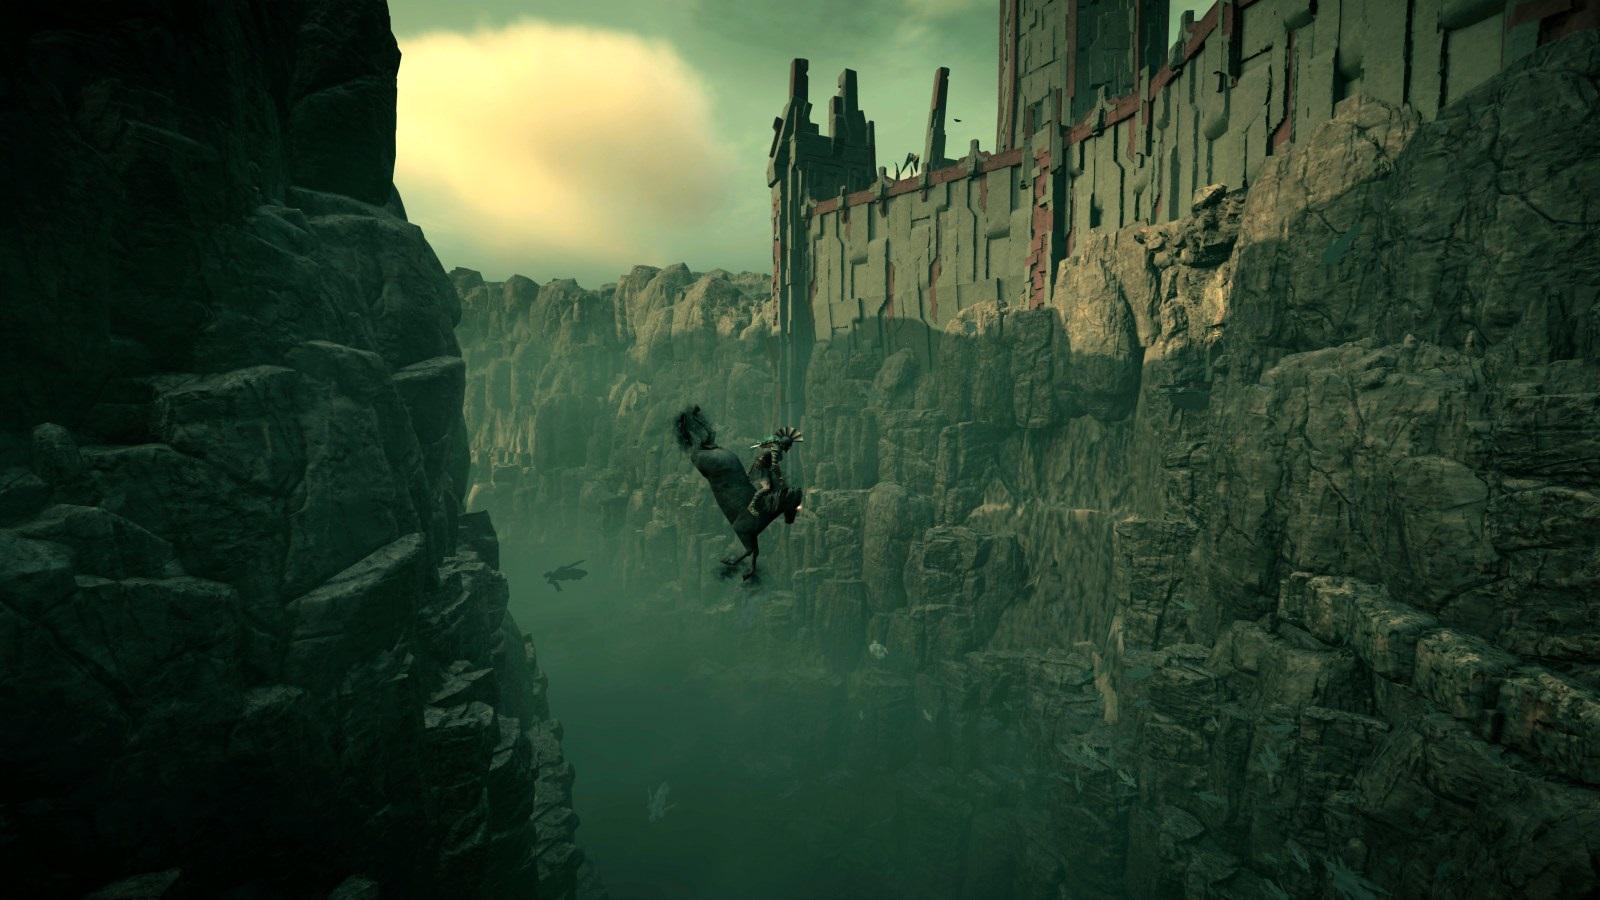 Assassin's Creed Odyssey: Fate of Atlantis (RECENZE) | Alza cz